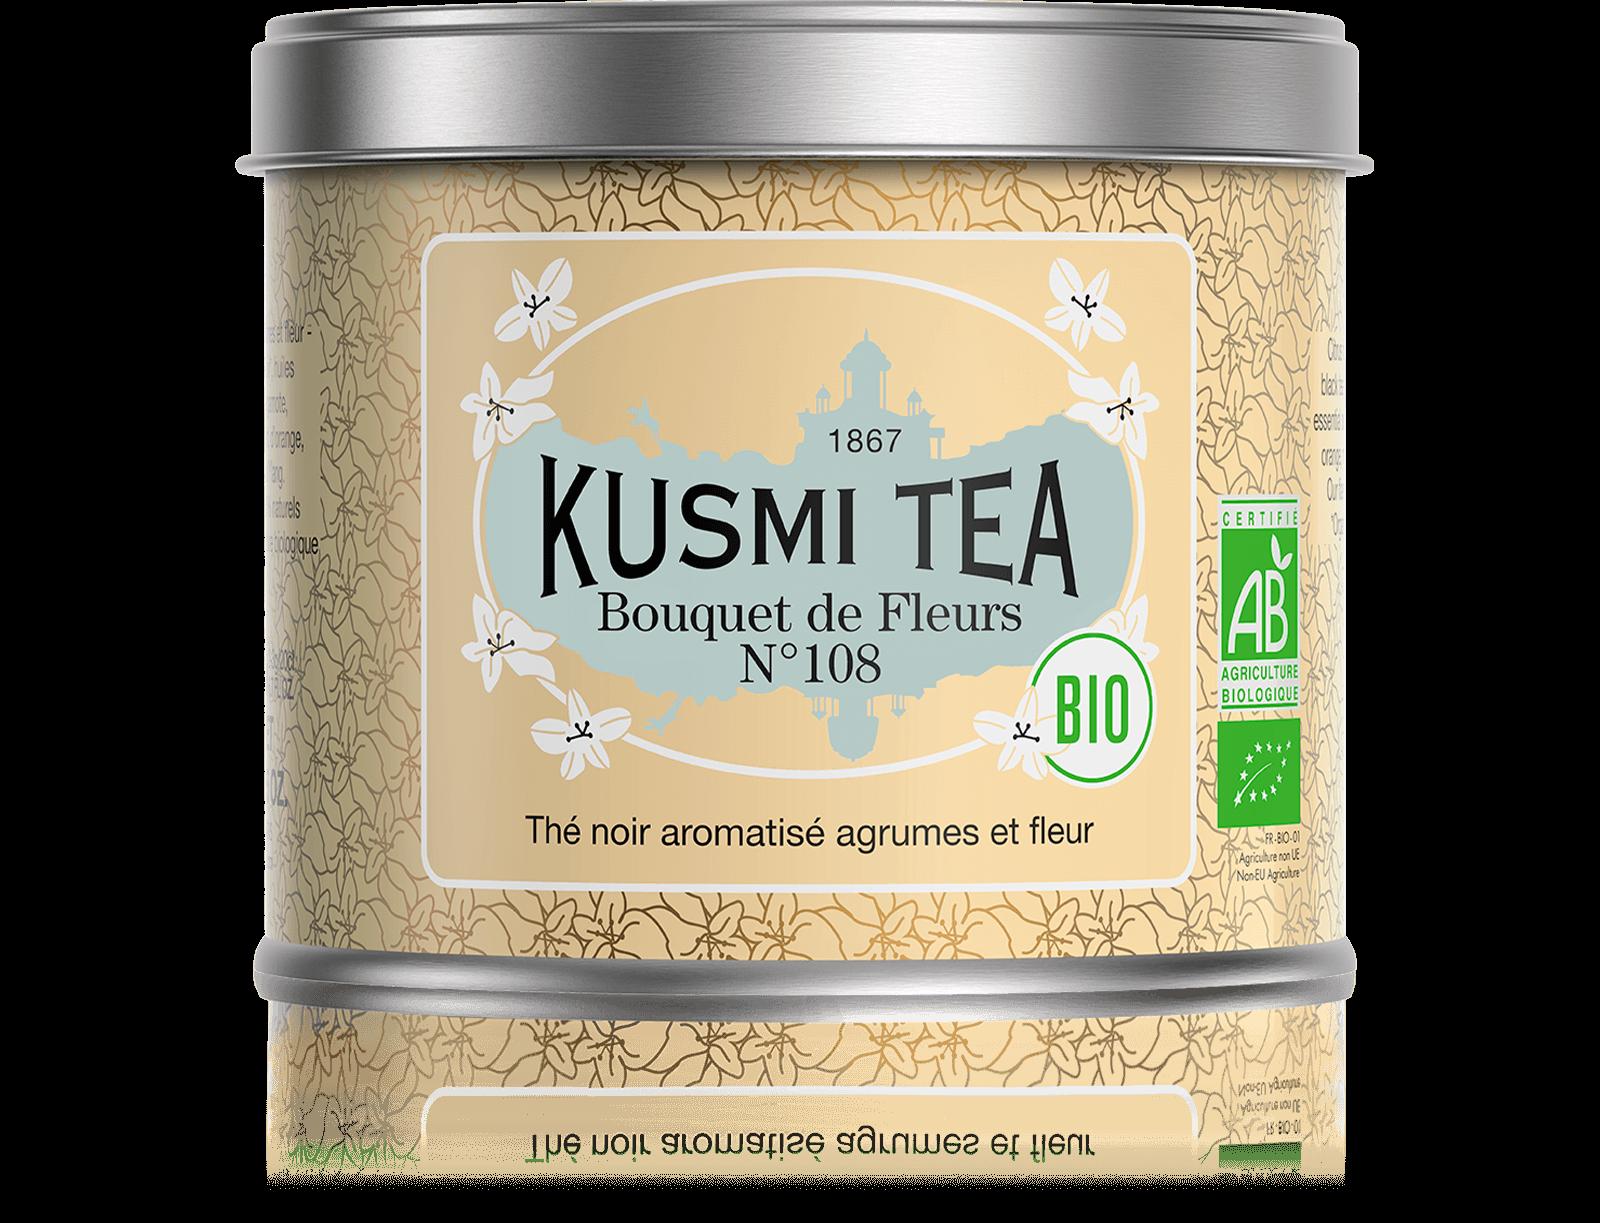 Bouquet de Fleurs N°108 bio - Thé earl grey, fleur Ylang-Ylang - Boîte de thé en vrac - Kusmi Tea